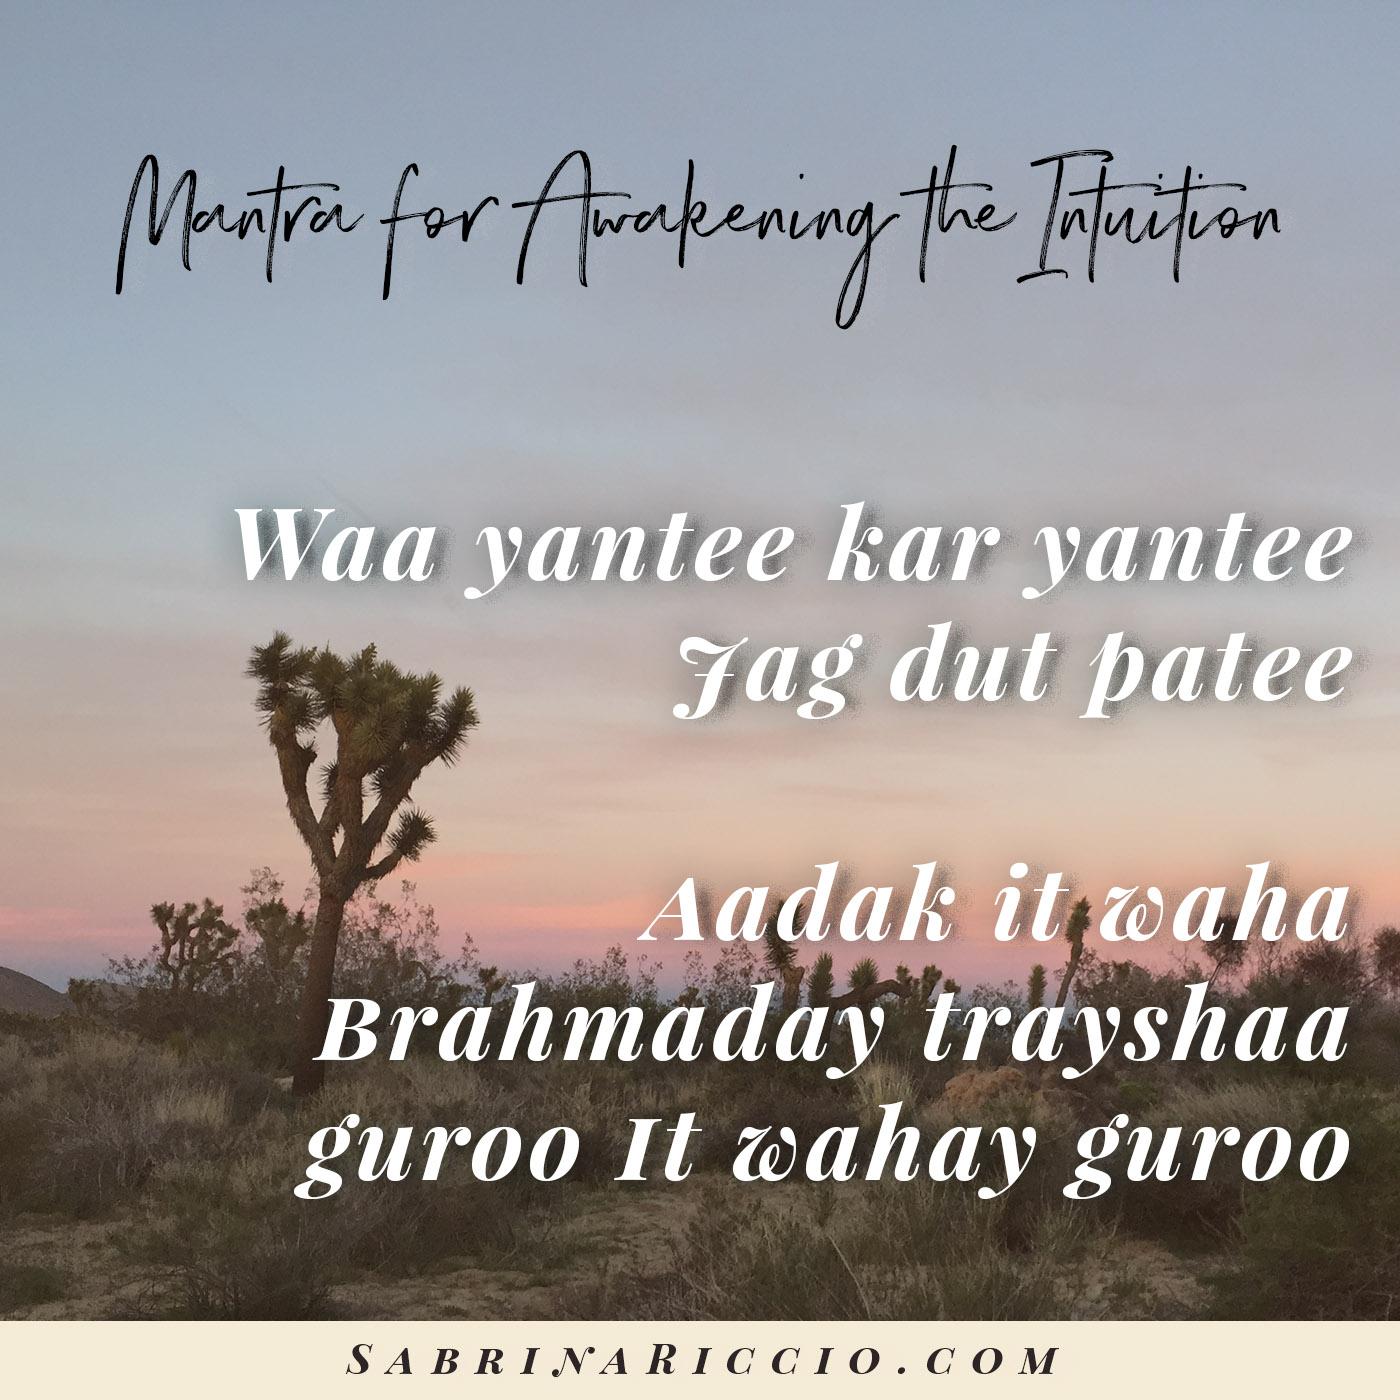 Wah Yantee | Mantra for Awakening the Intuition | SabrinaRiccio.com